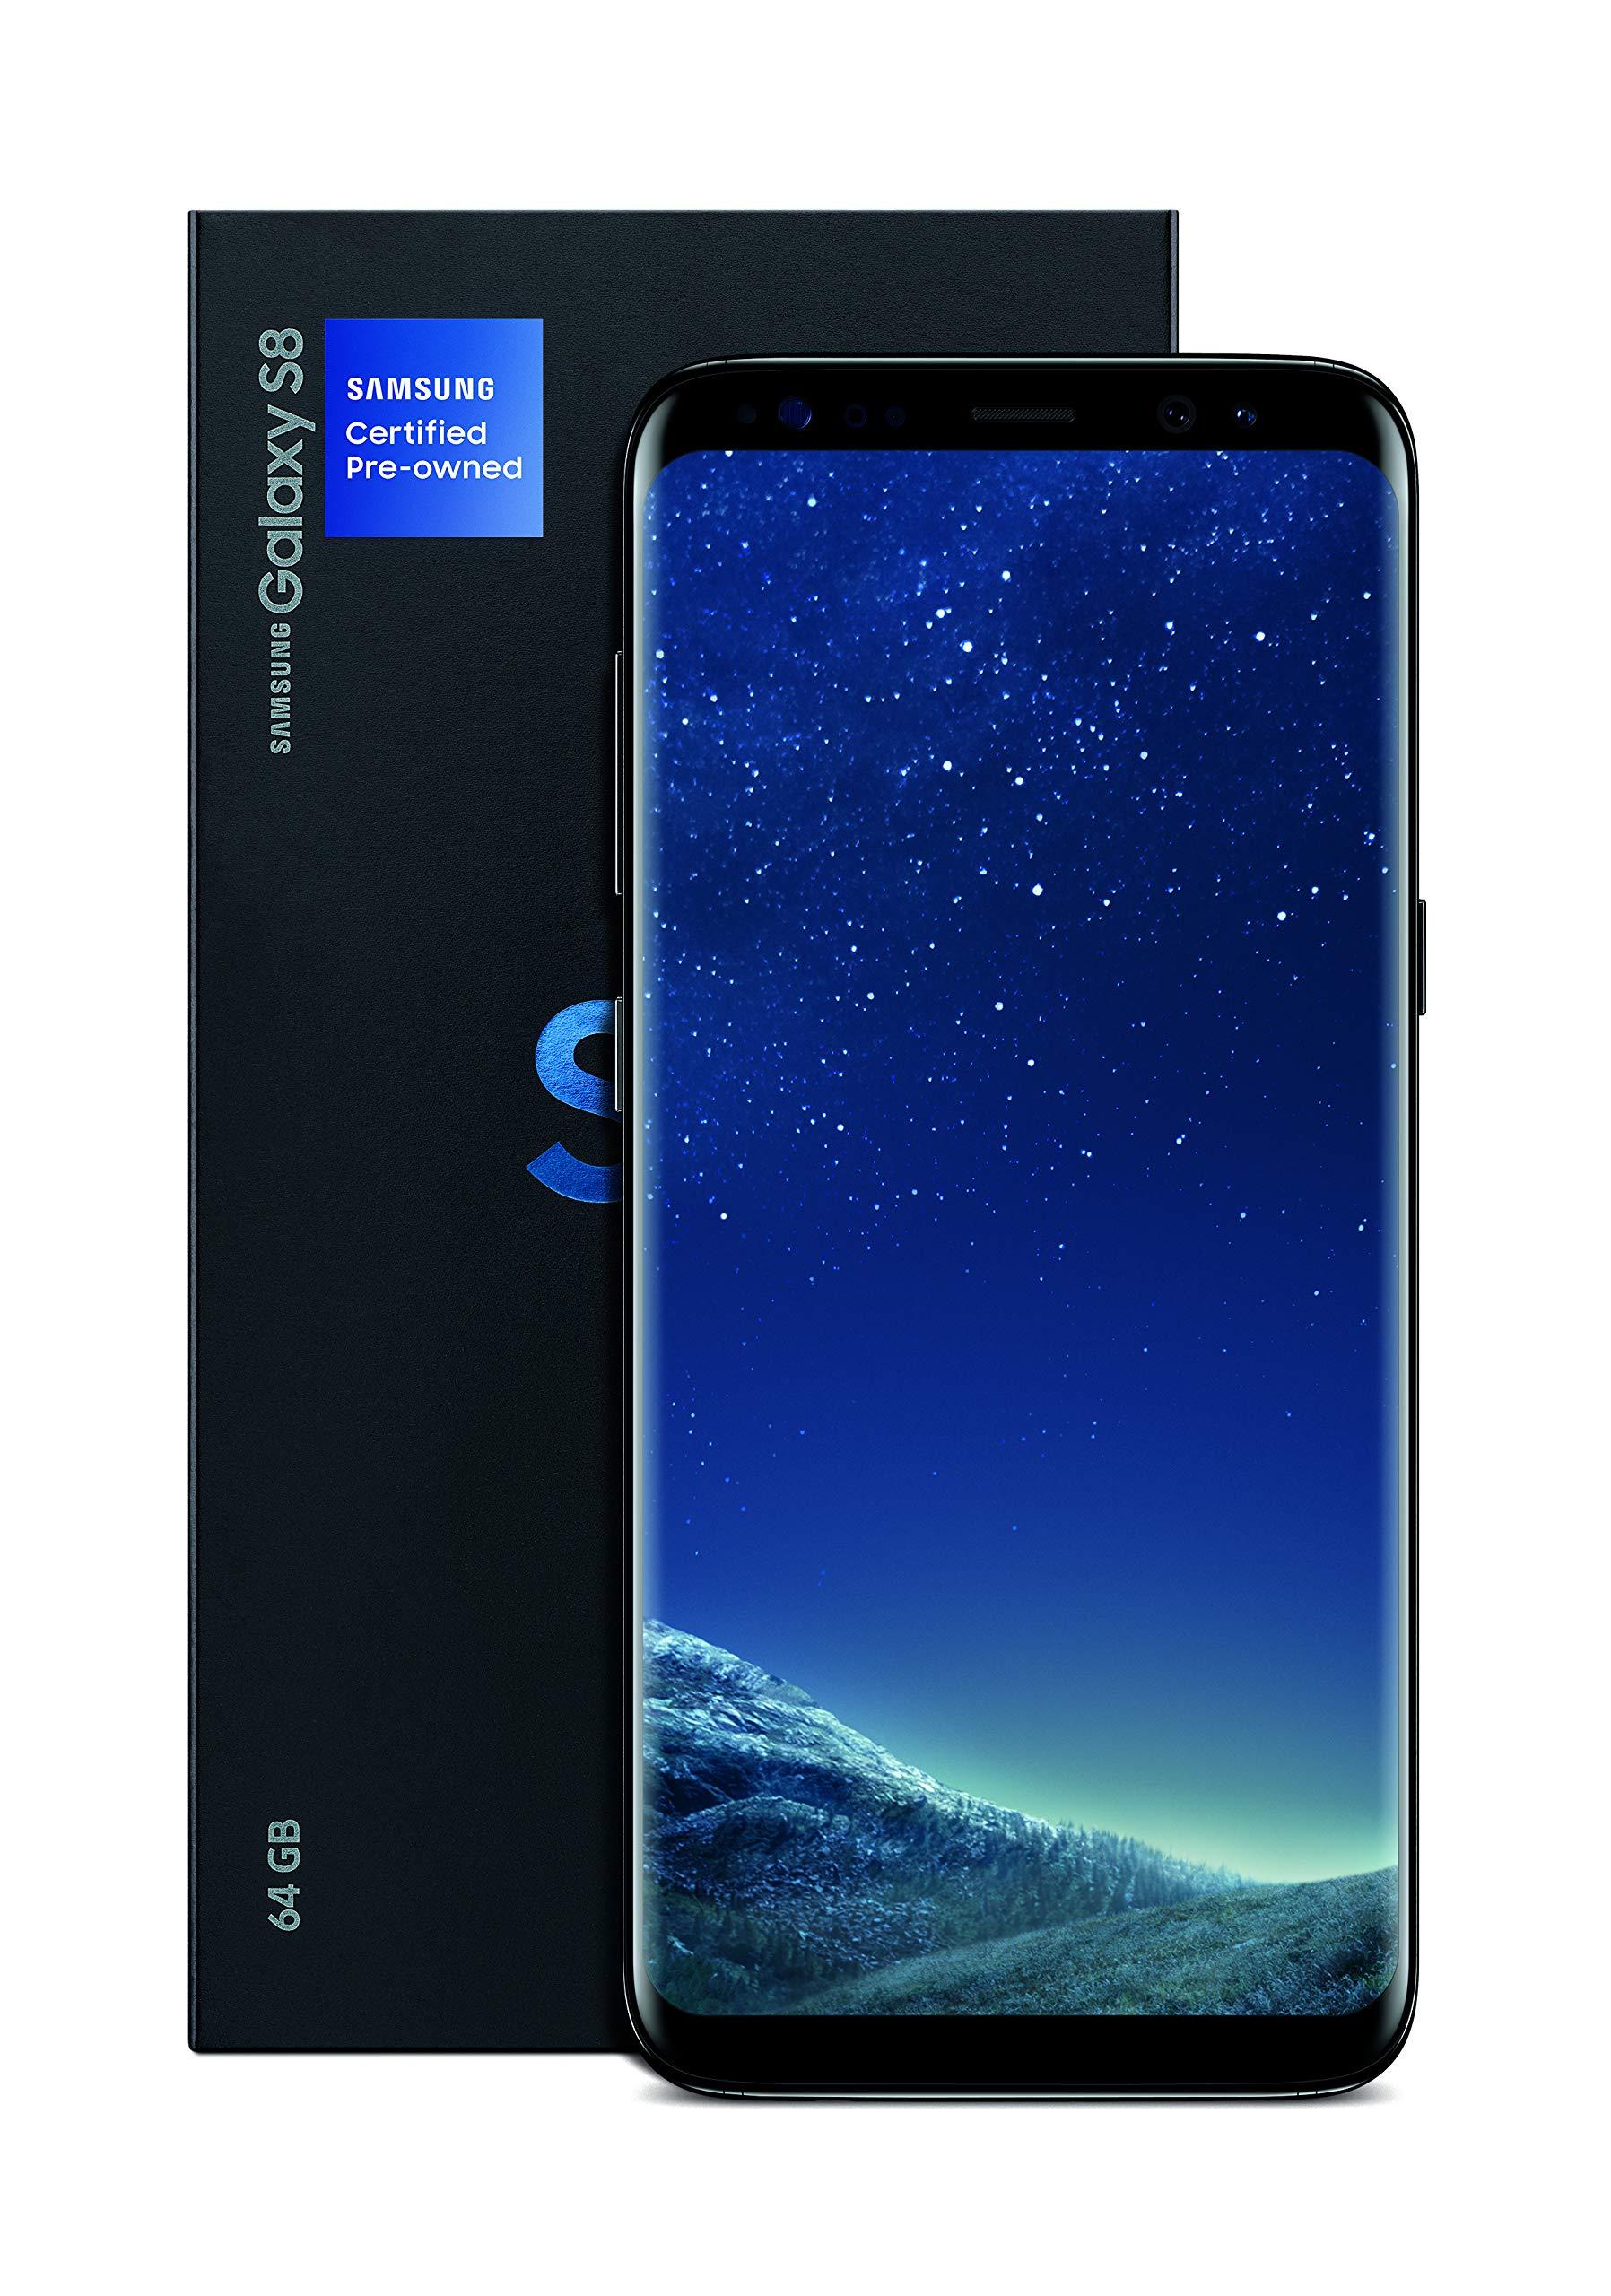 Samsung Galaxy S8 Certified Pre-Owned Factory Unlocked Phone - 5.8Inch Screen - 64GB - Midnight Black (U.S. Version) (Rene...